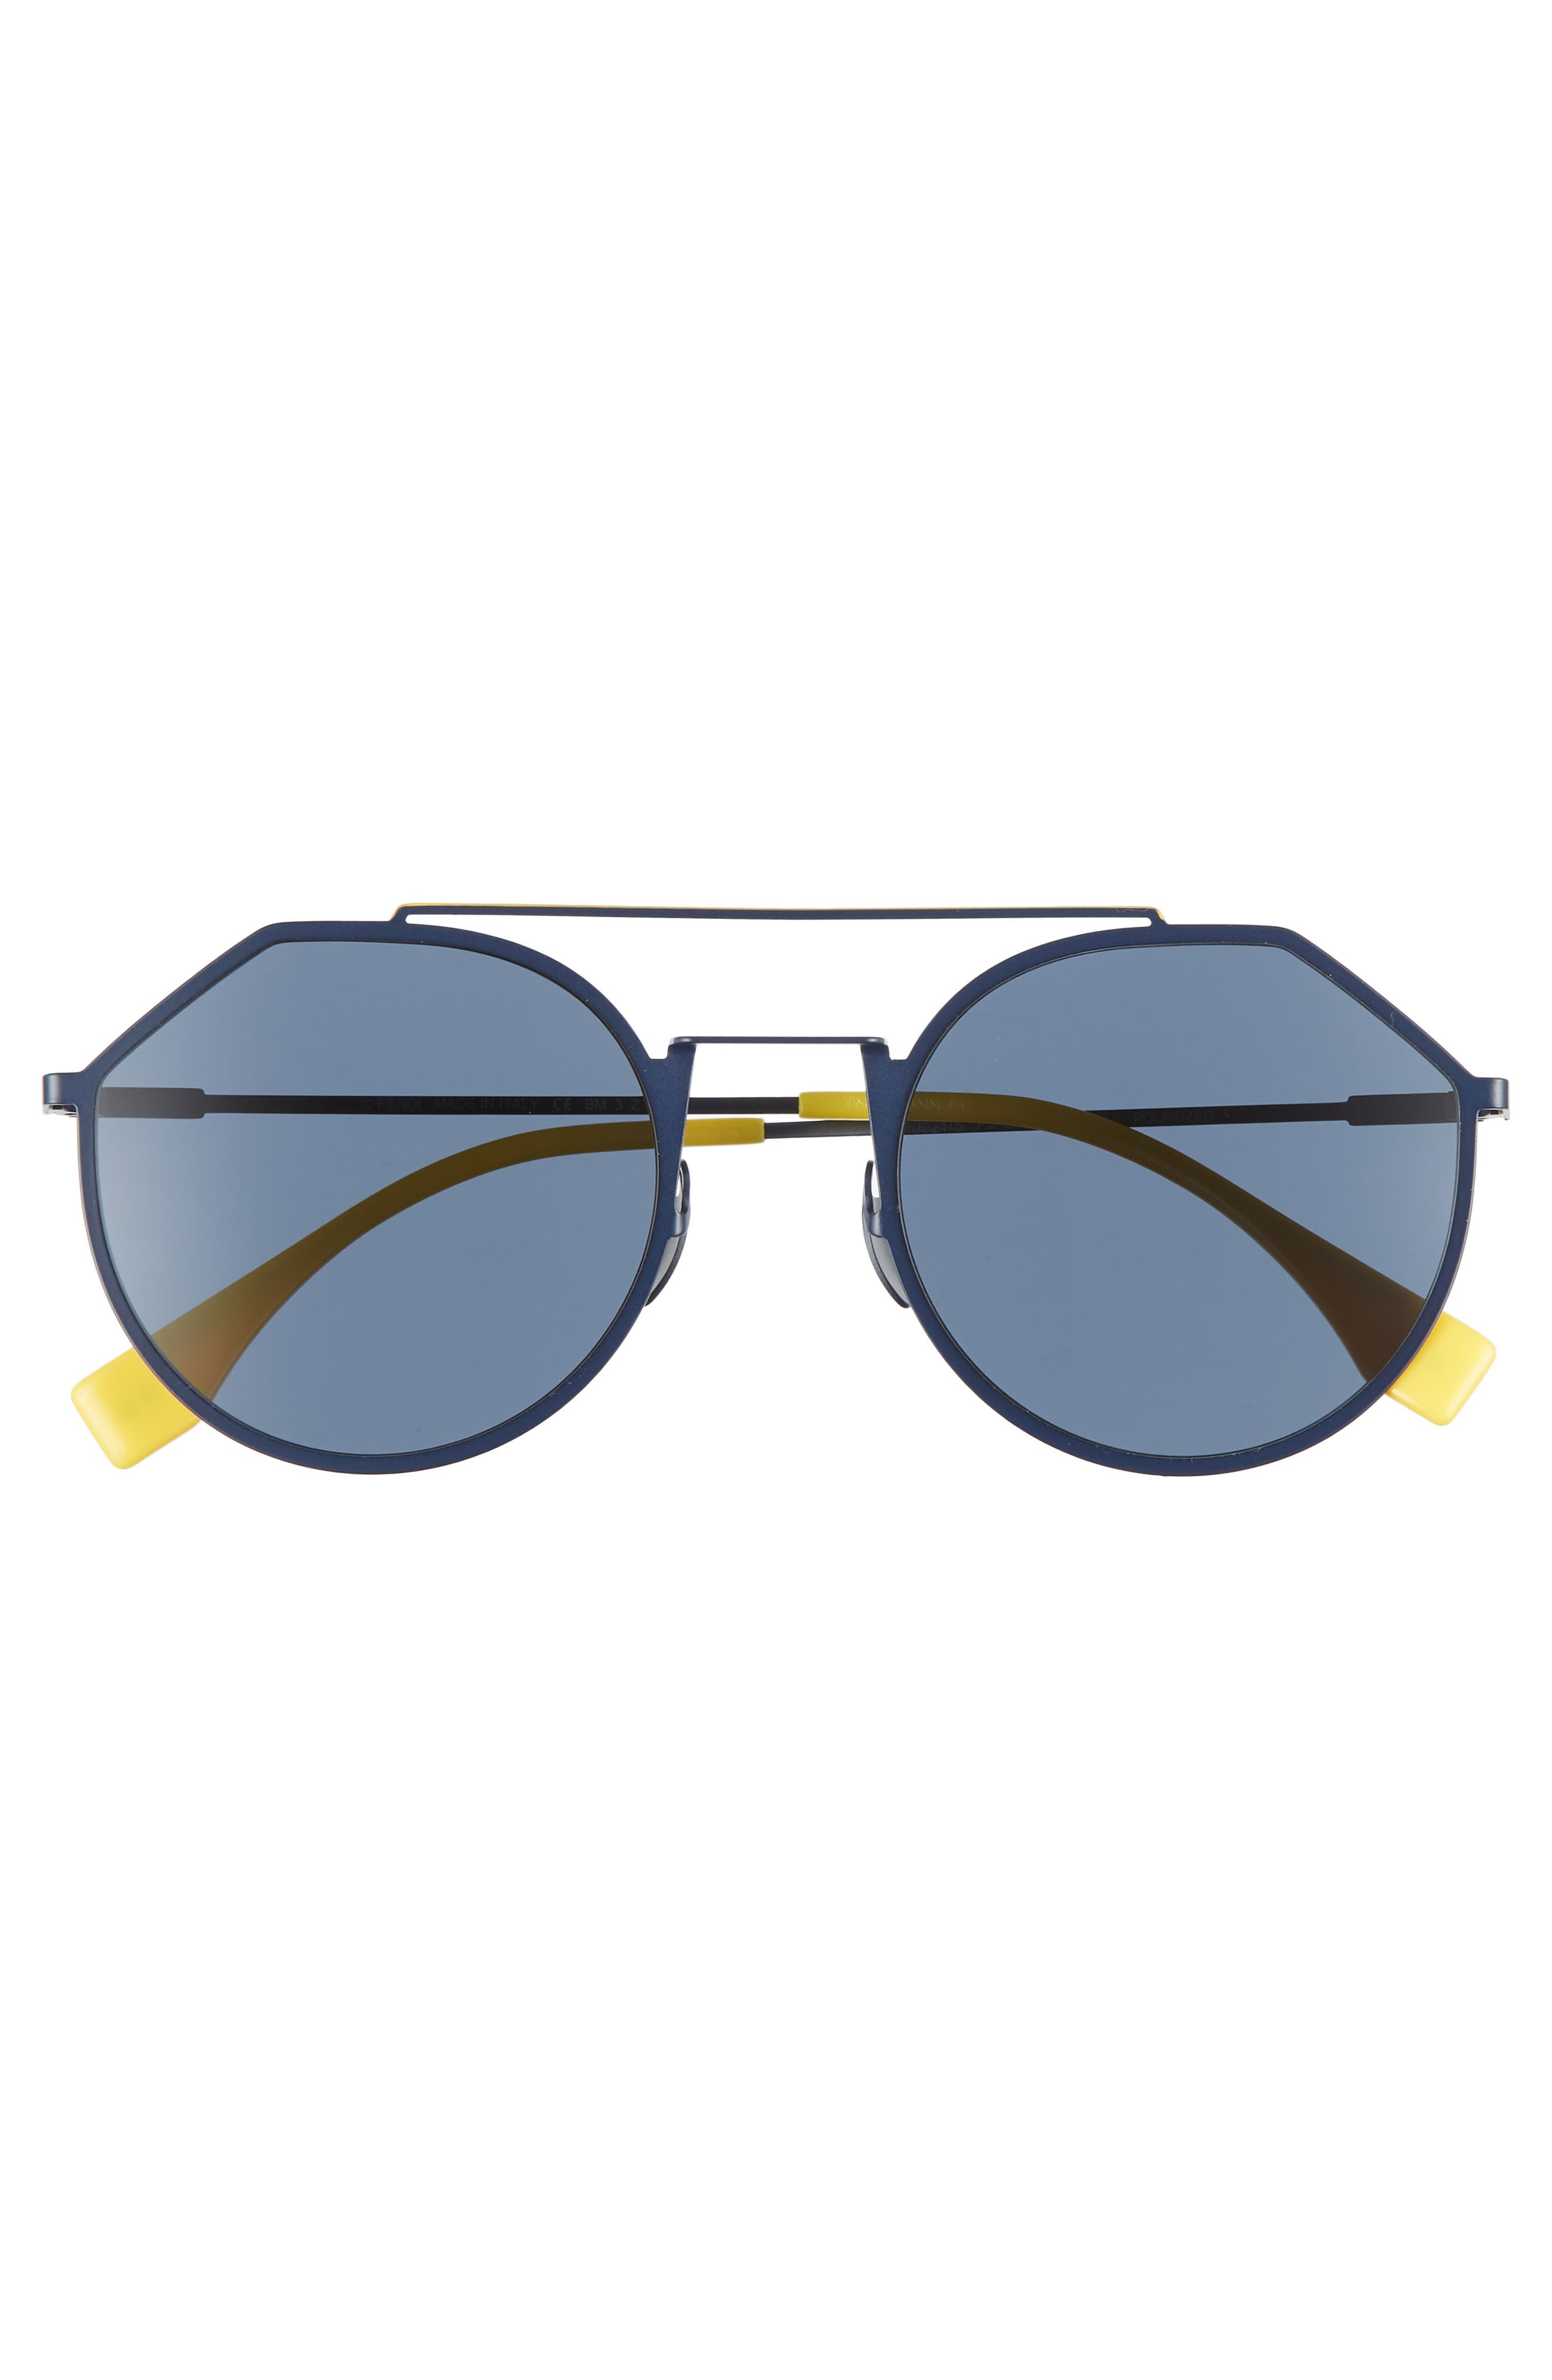 54mm Polarized Round Sunglasses,                             Alternate thumbnail 3, color,                             BLUE